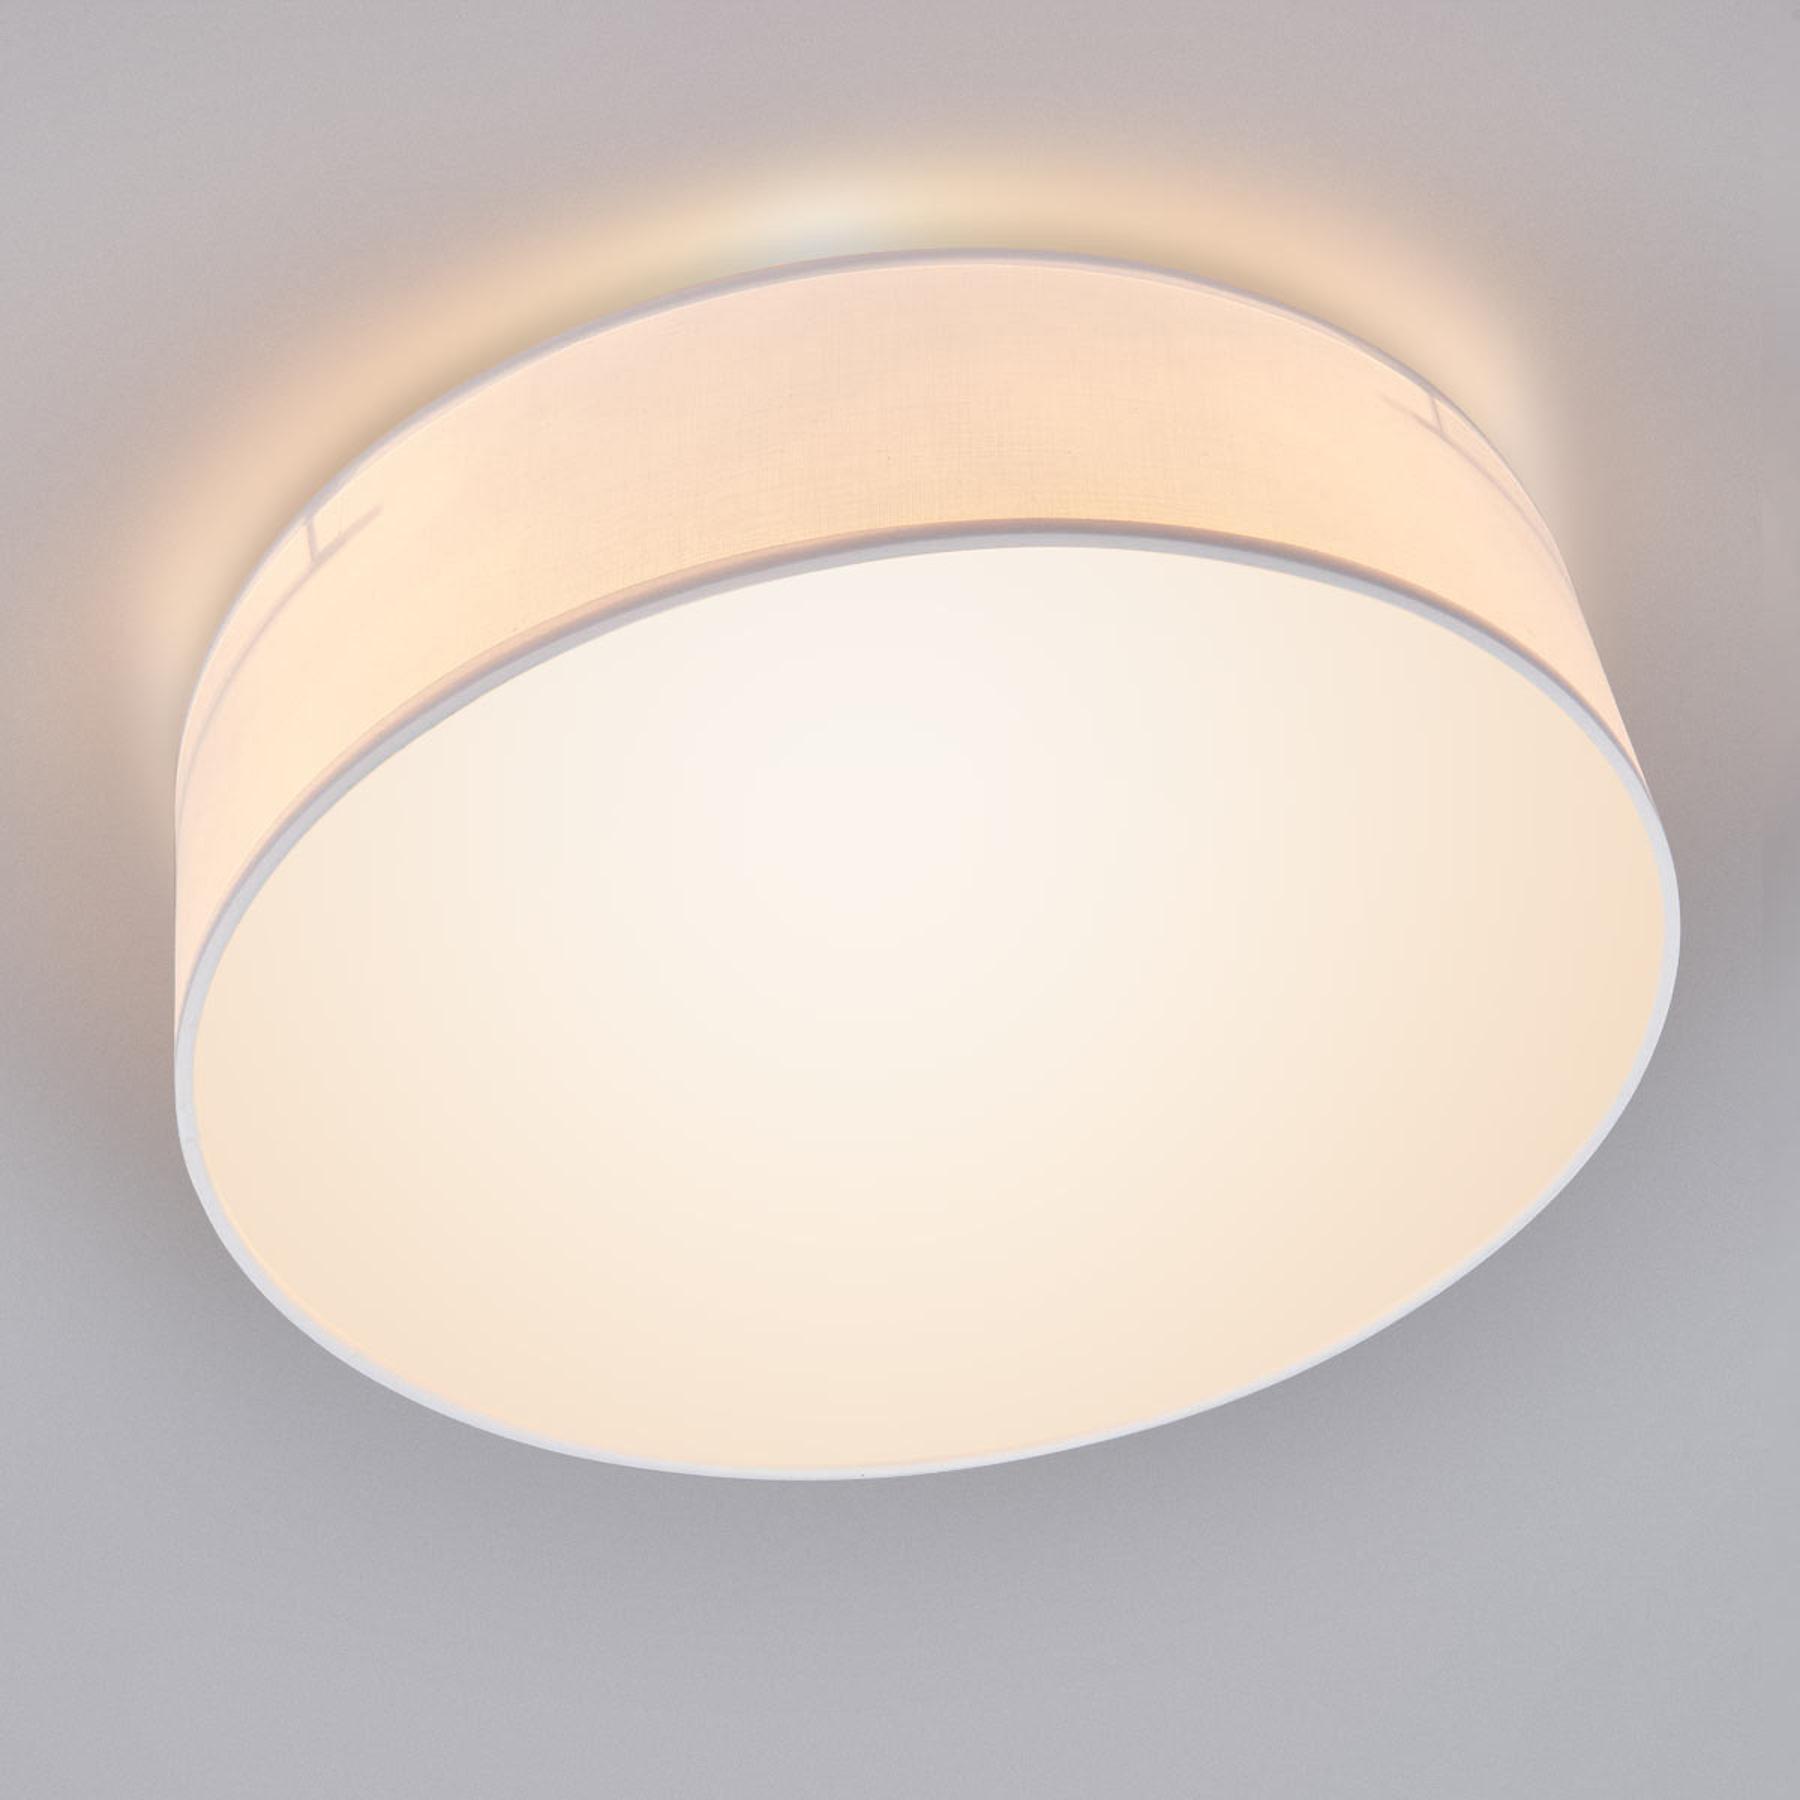 Witte textiel-plafondlamp Ceiling Dream 40 cm